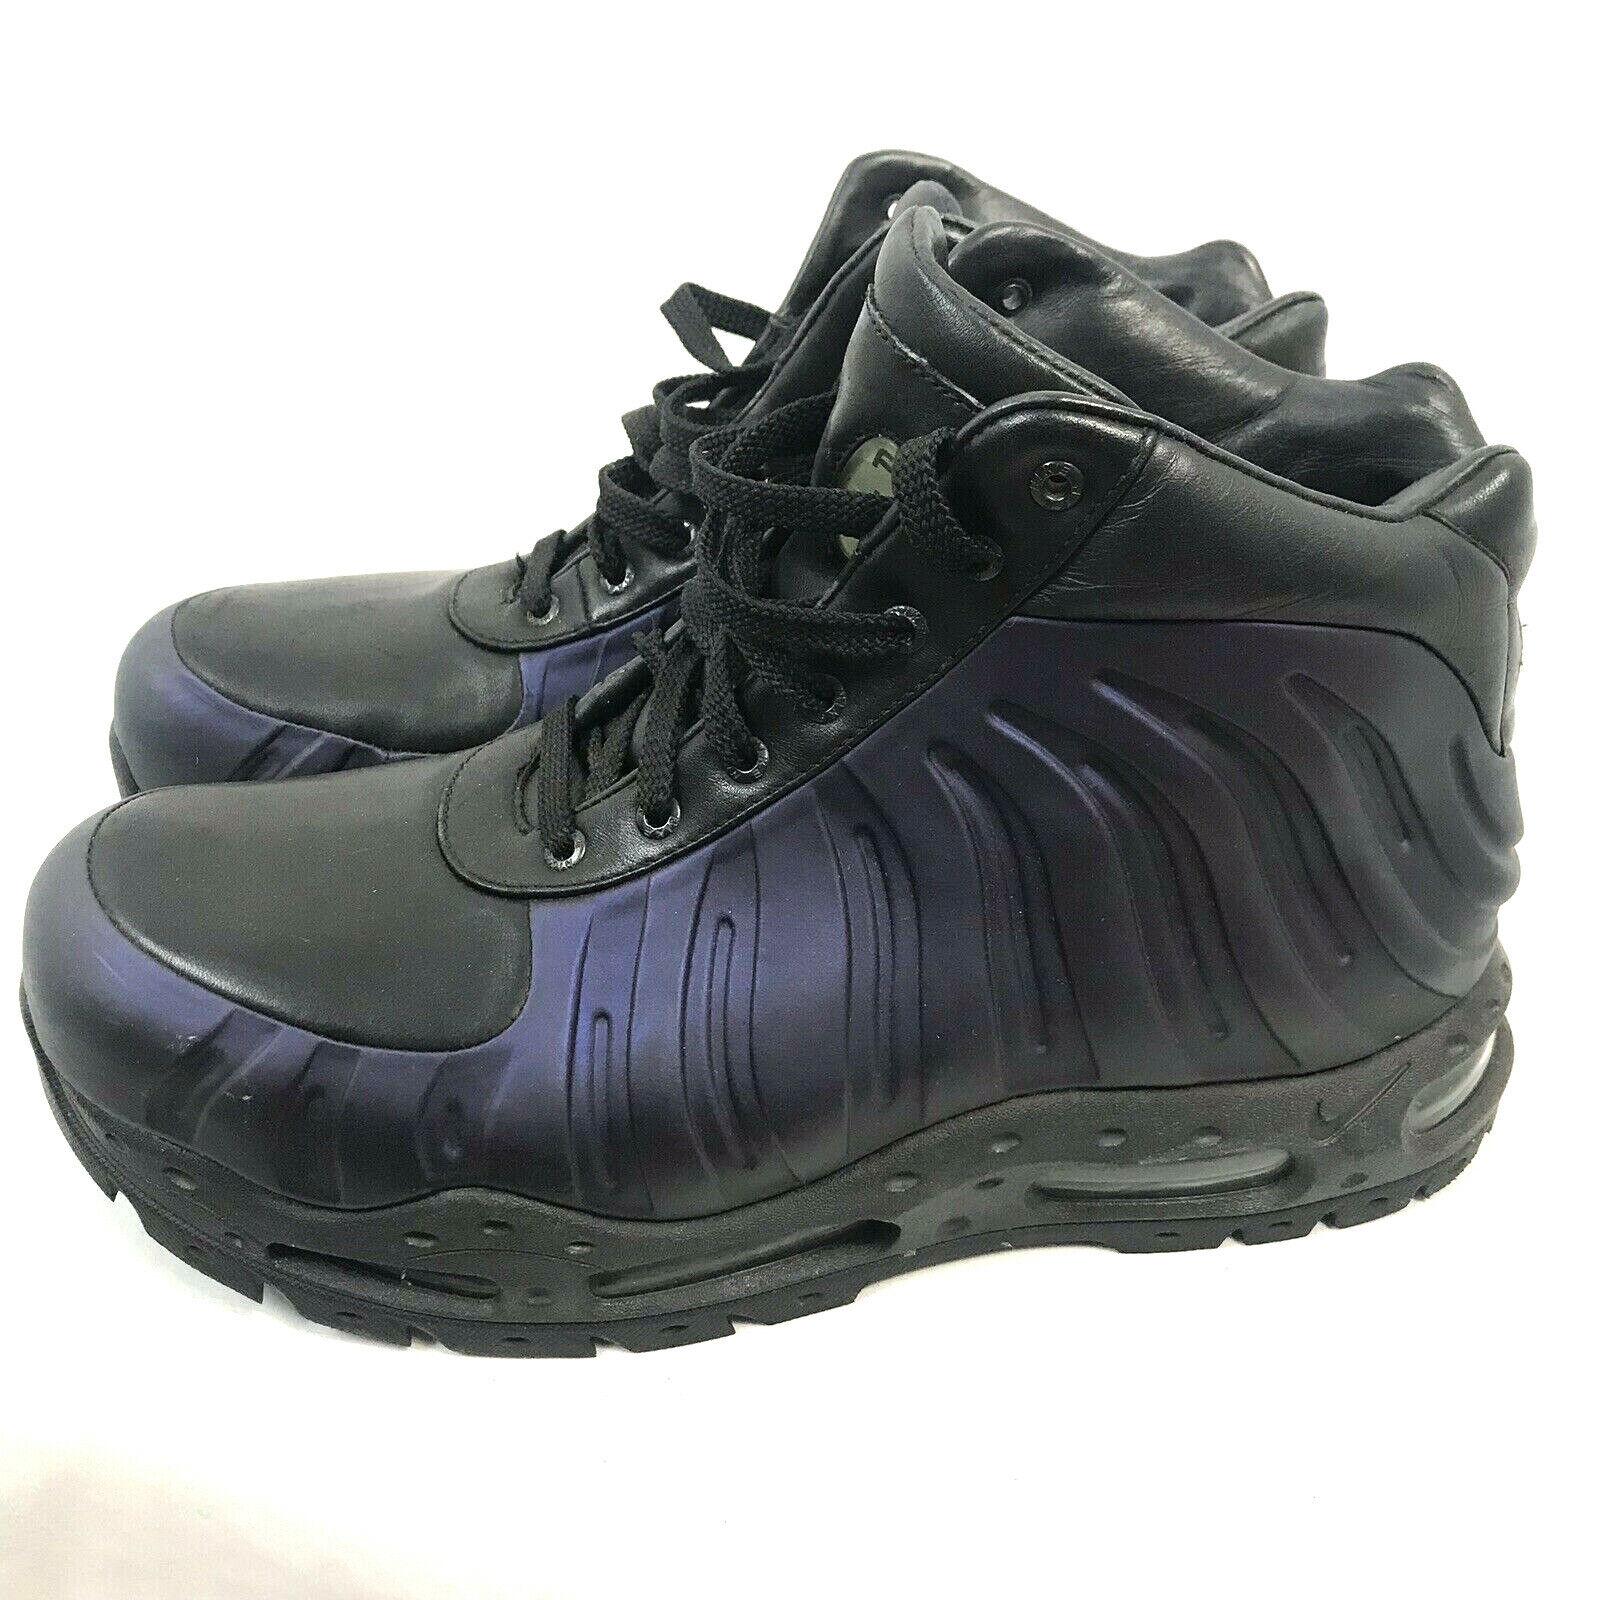 Nike Air Max Foamposite Foamdome Stiefel,Aubergine,Herren Größe UK 11,333791-504